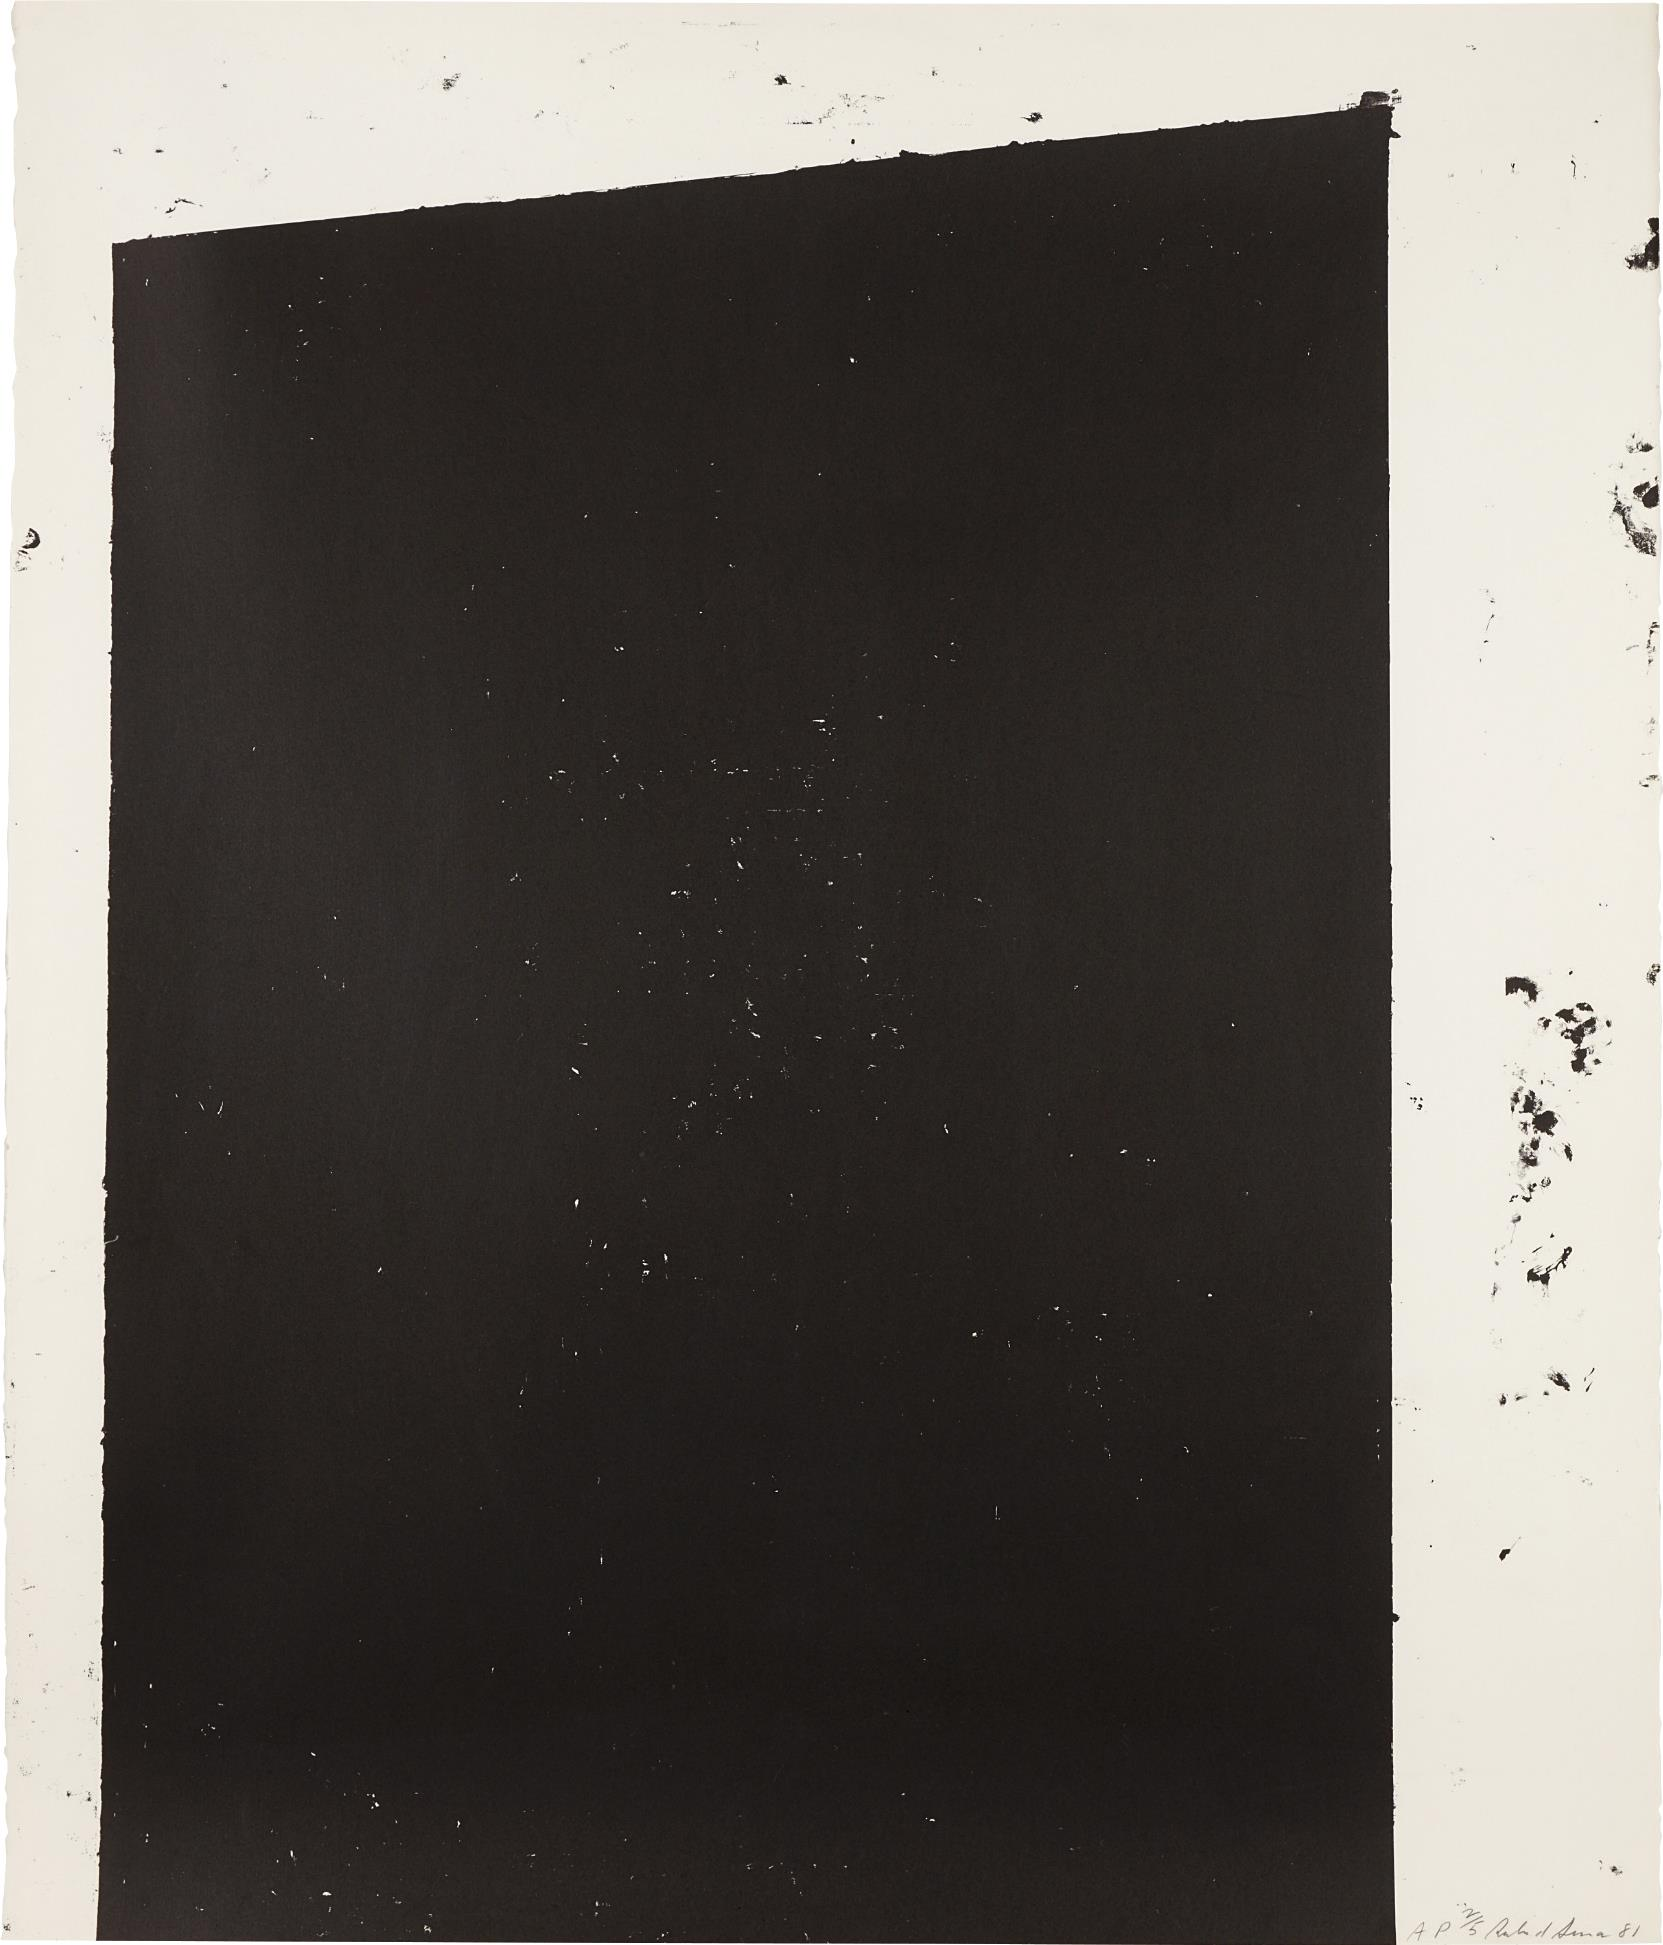 Richard Serra-Malcolm X-1981